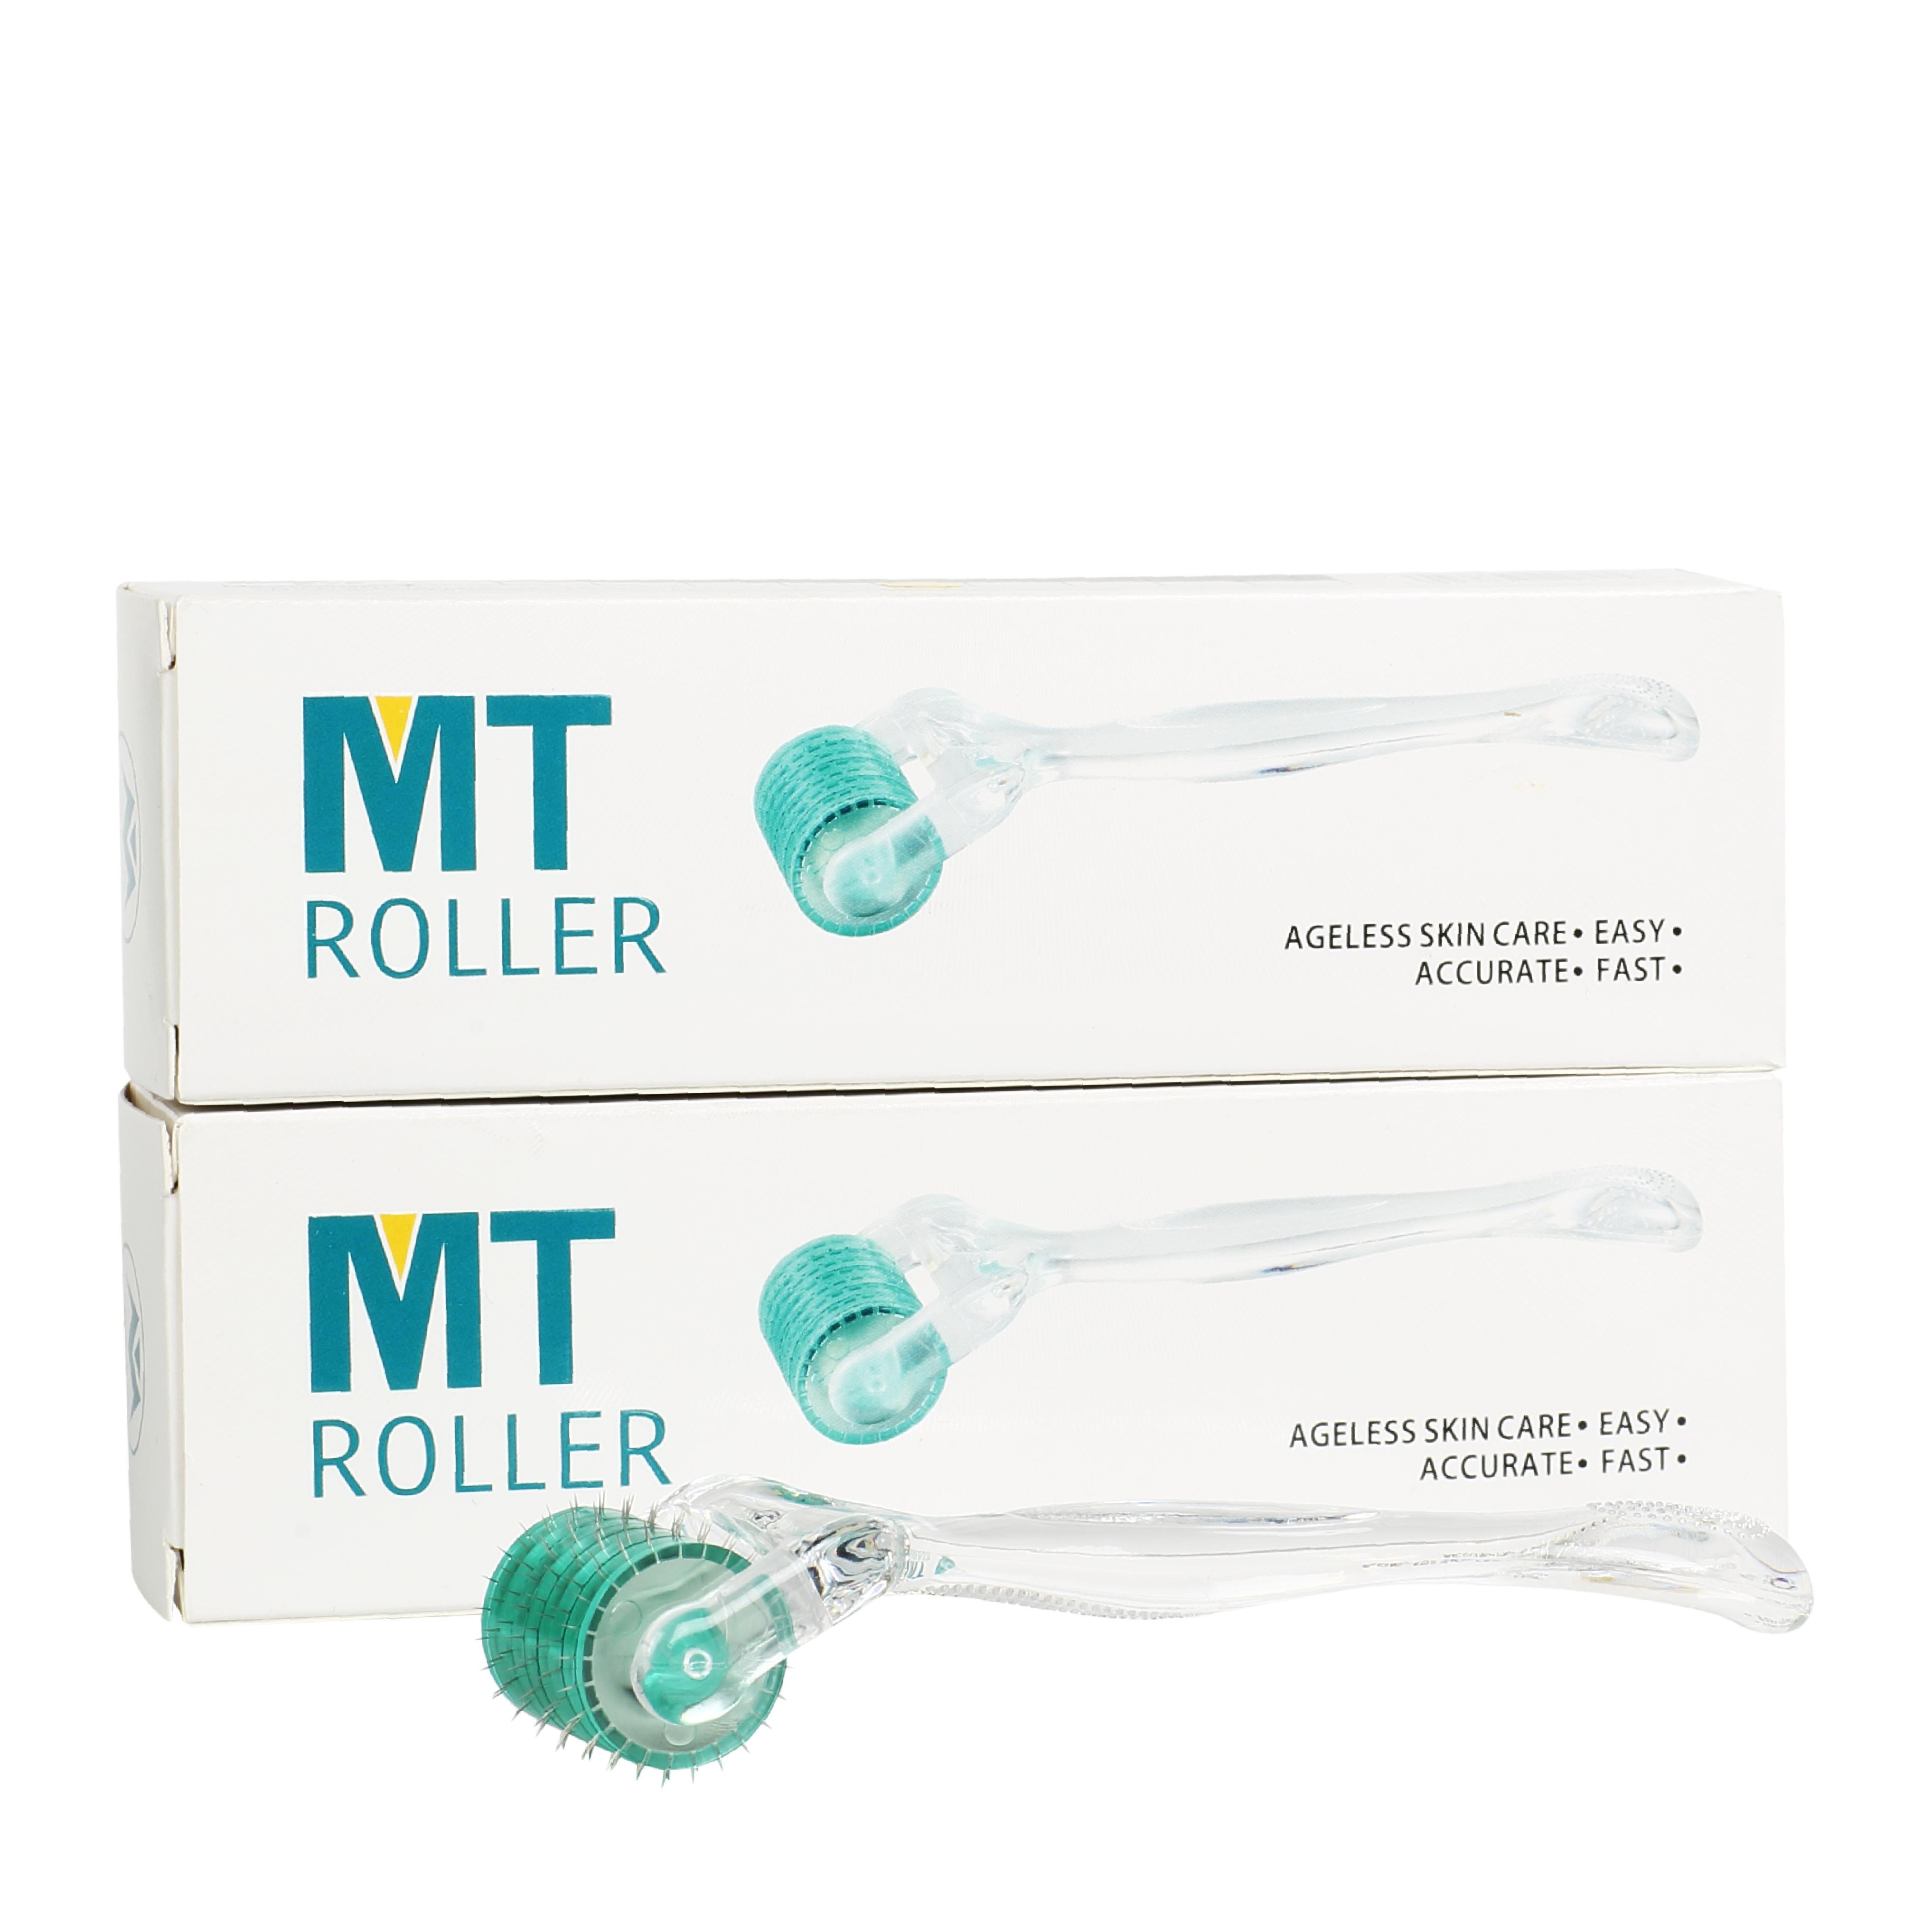 MT Dermaroller 2-kit